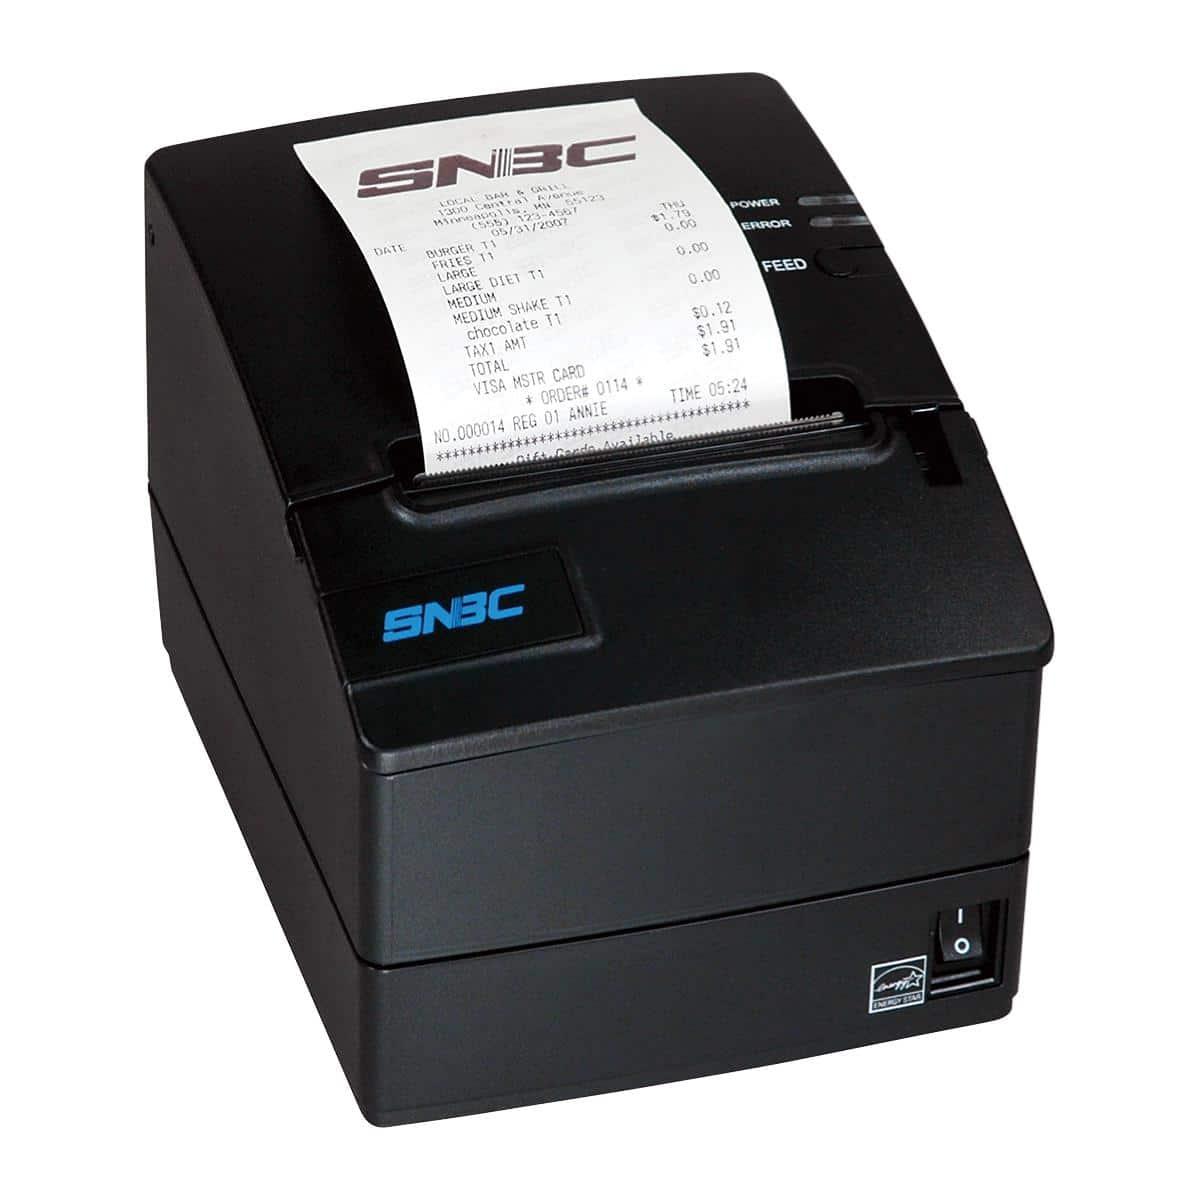 SNBC Printer BTP-R980III USB+Serial+Ethernet